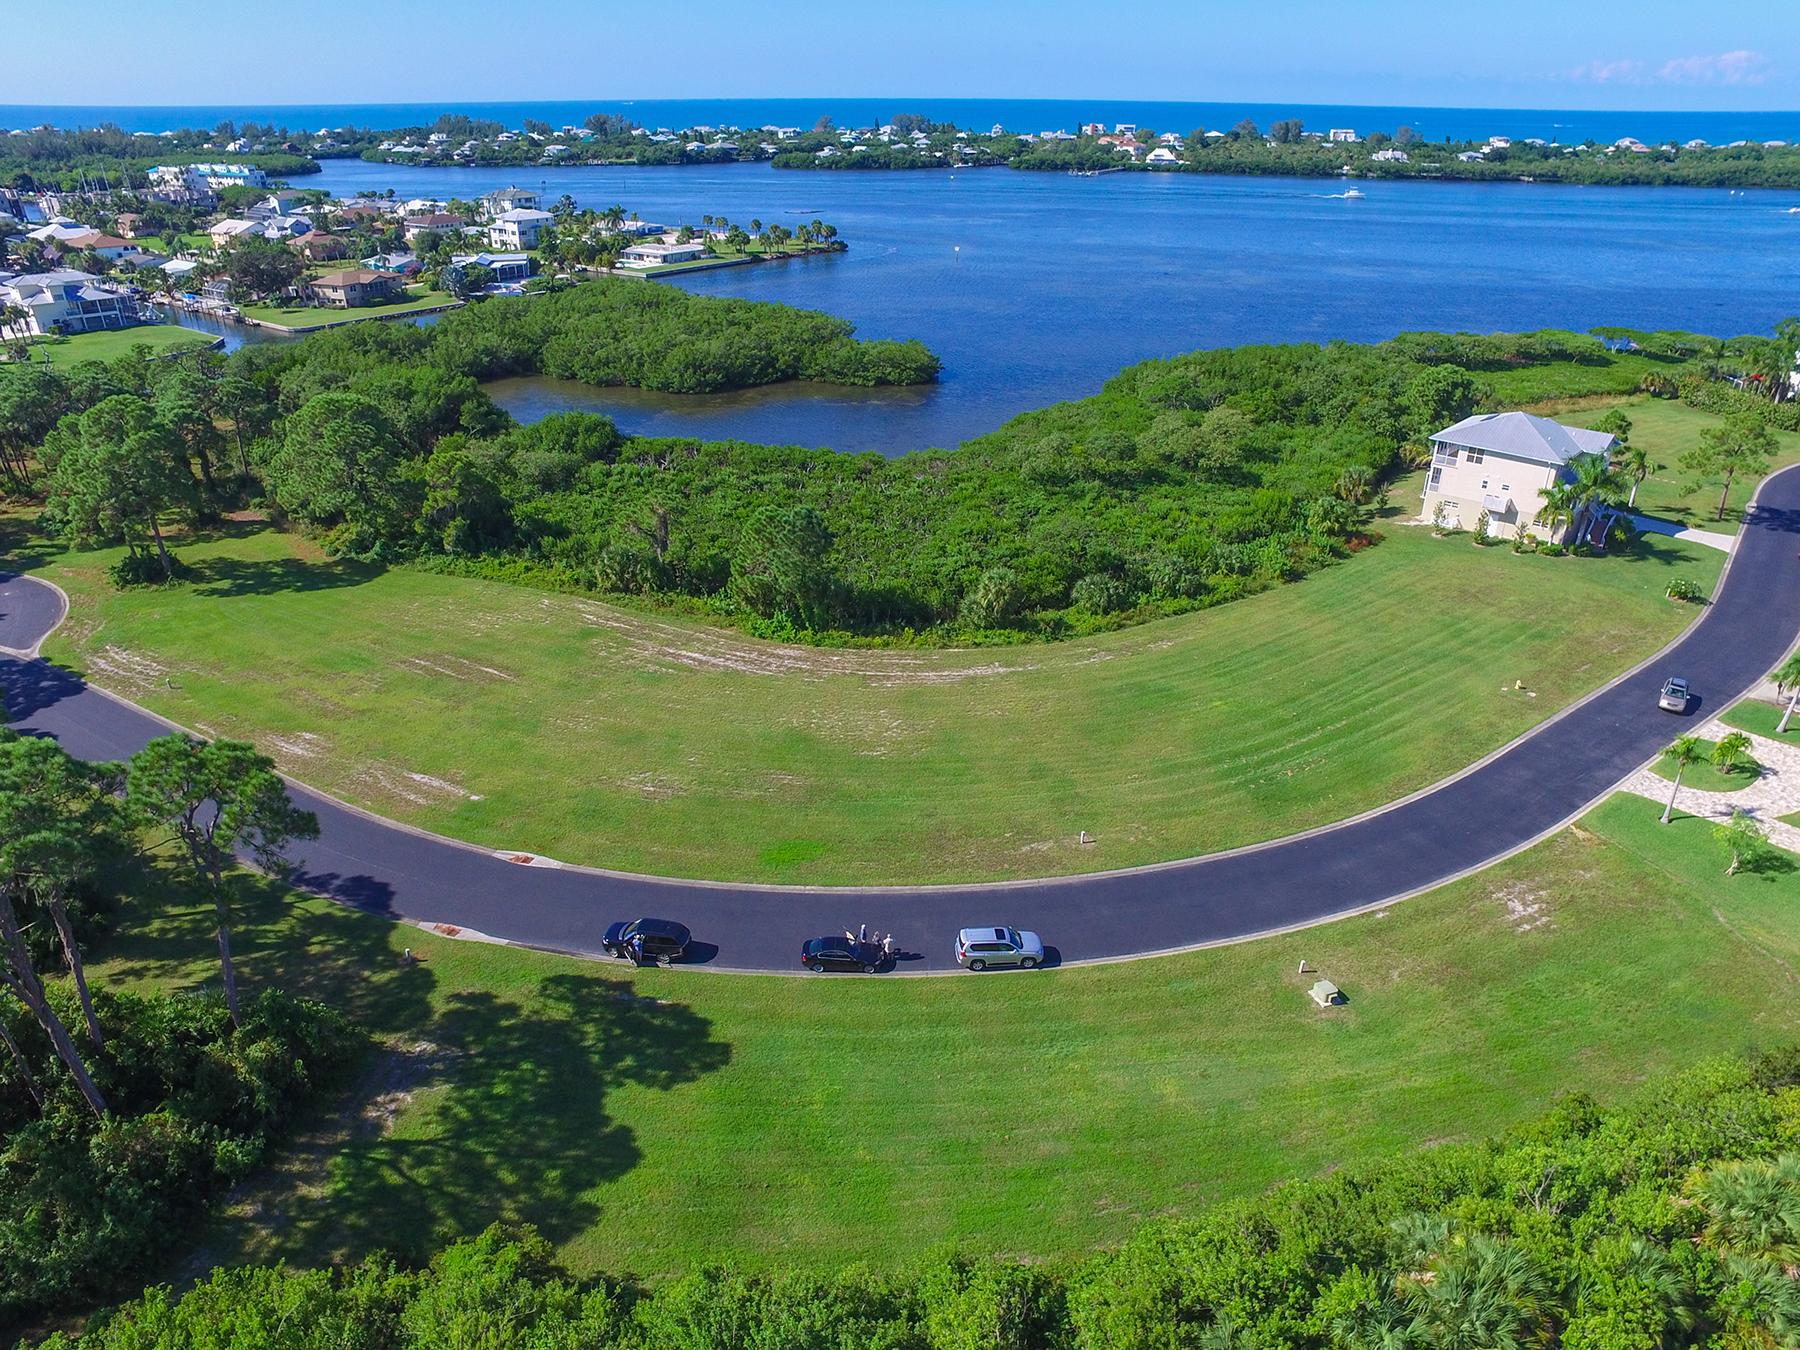 土地 为 销售 在 EAGLE PRPESERVE 10121 Eagle Preserve Dr 24 恩格尔伍德, 佛罗里达州, 34224 美国